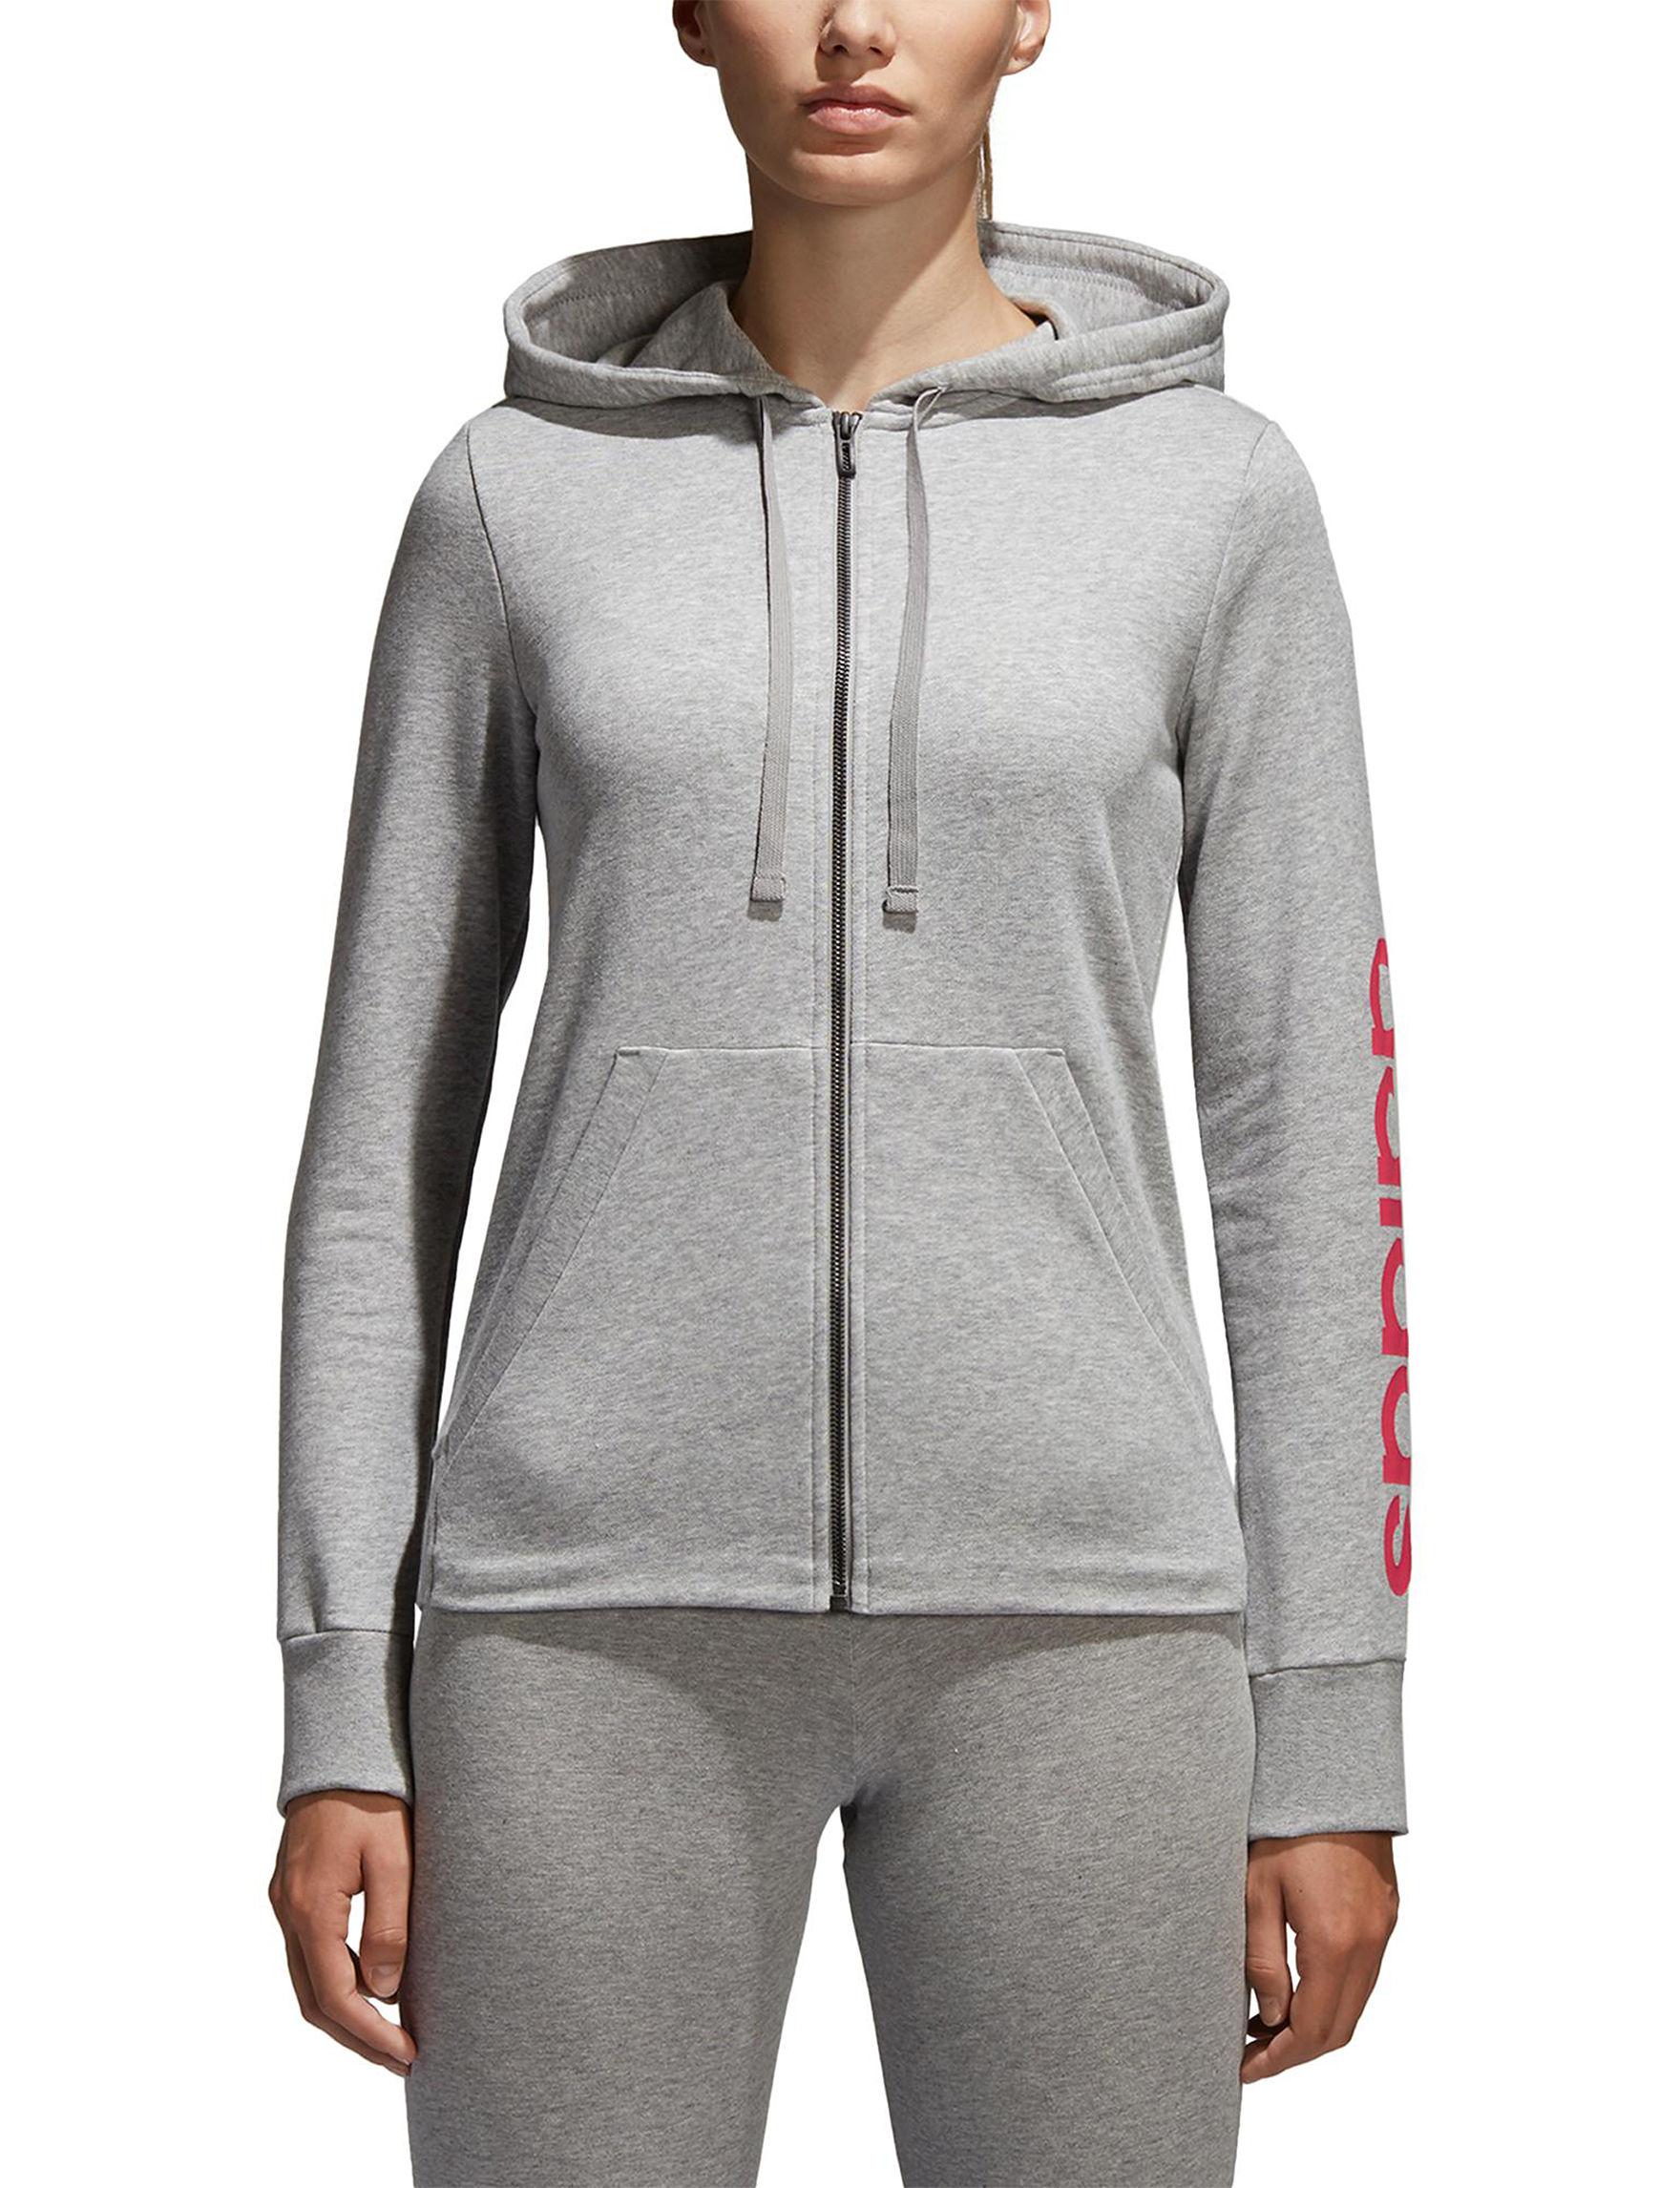 Adidas Grey Lightweight Jackets & Blazers